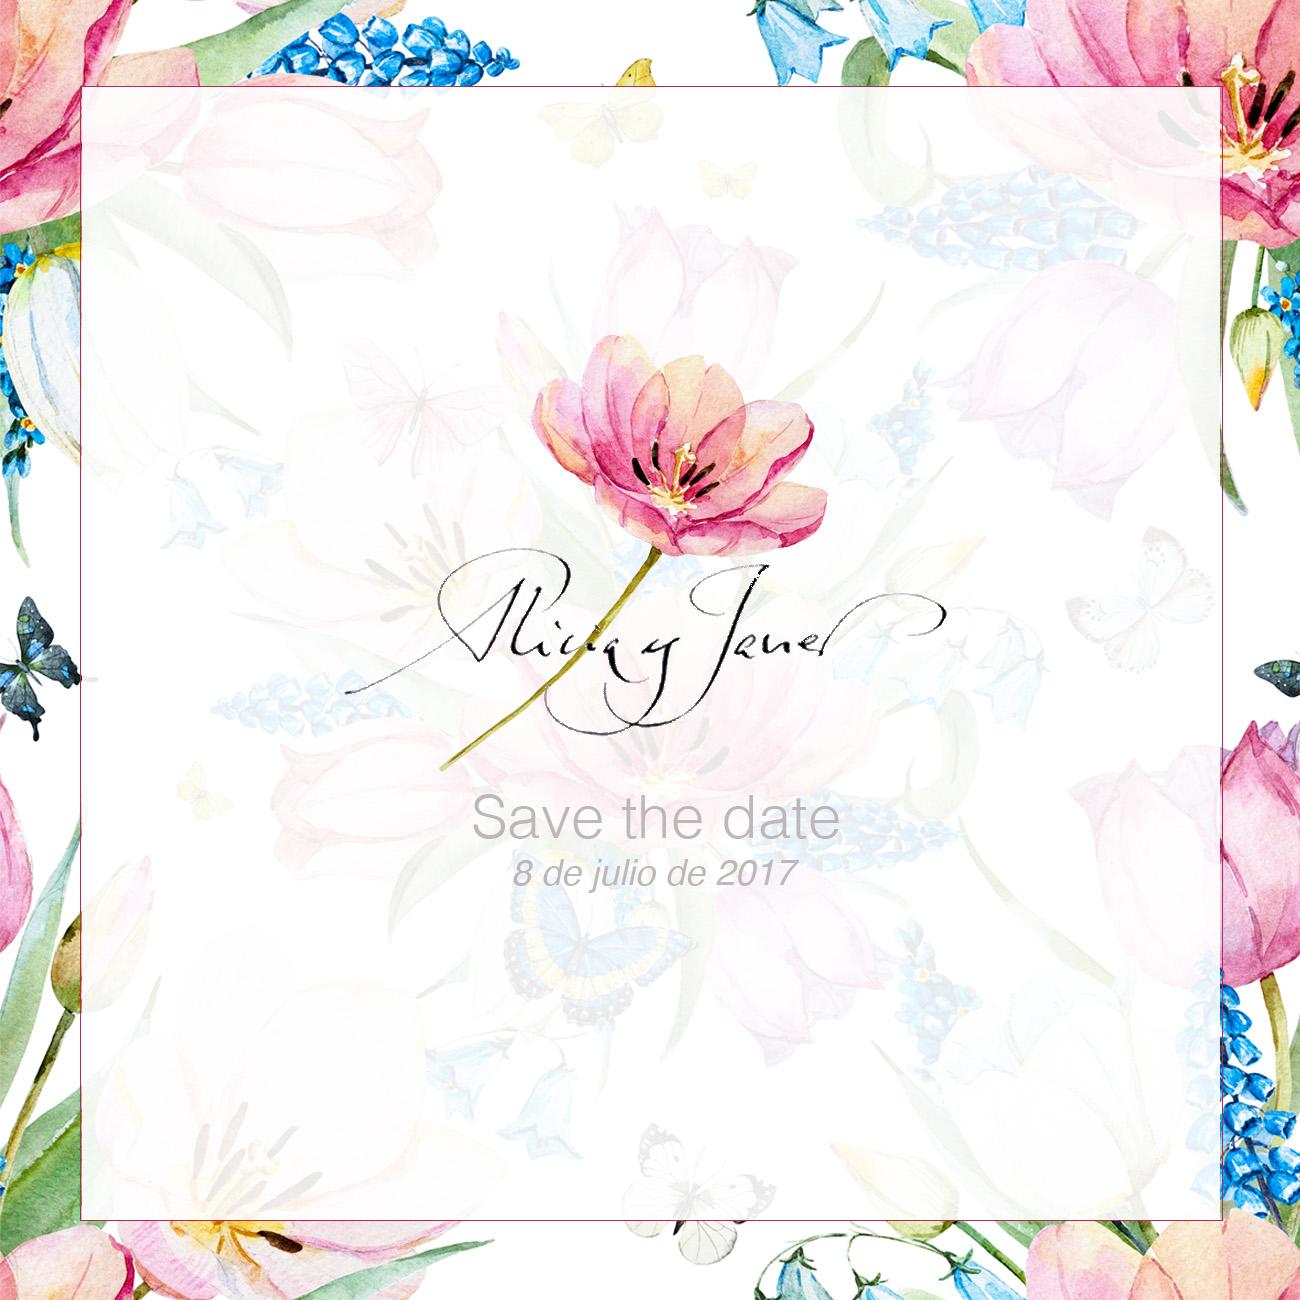 save the date - Alicia y Javier - Goyo Valmorisco, Calígrafo profesional. Profesor de caligrafía. Diseño caligráfico.